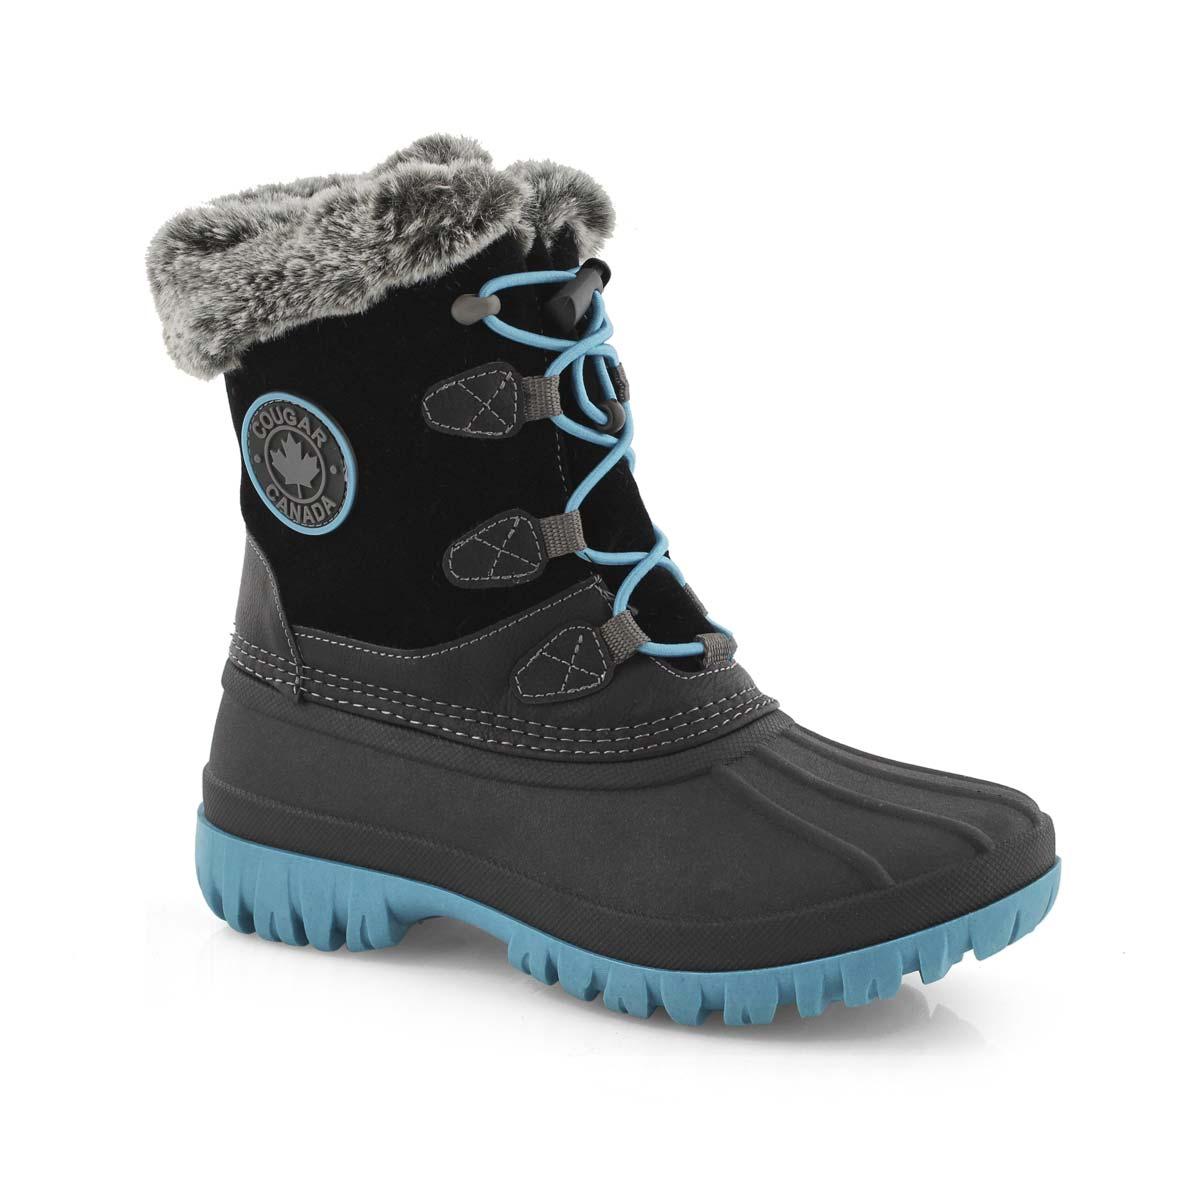 Grls Colette black wtpf winter boot